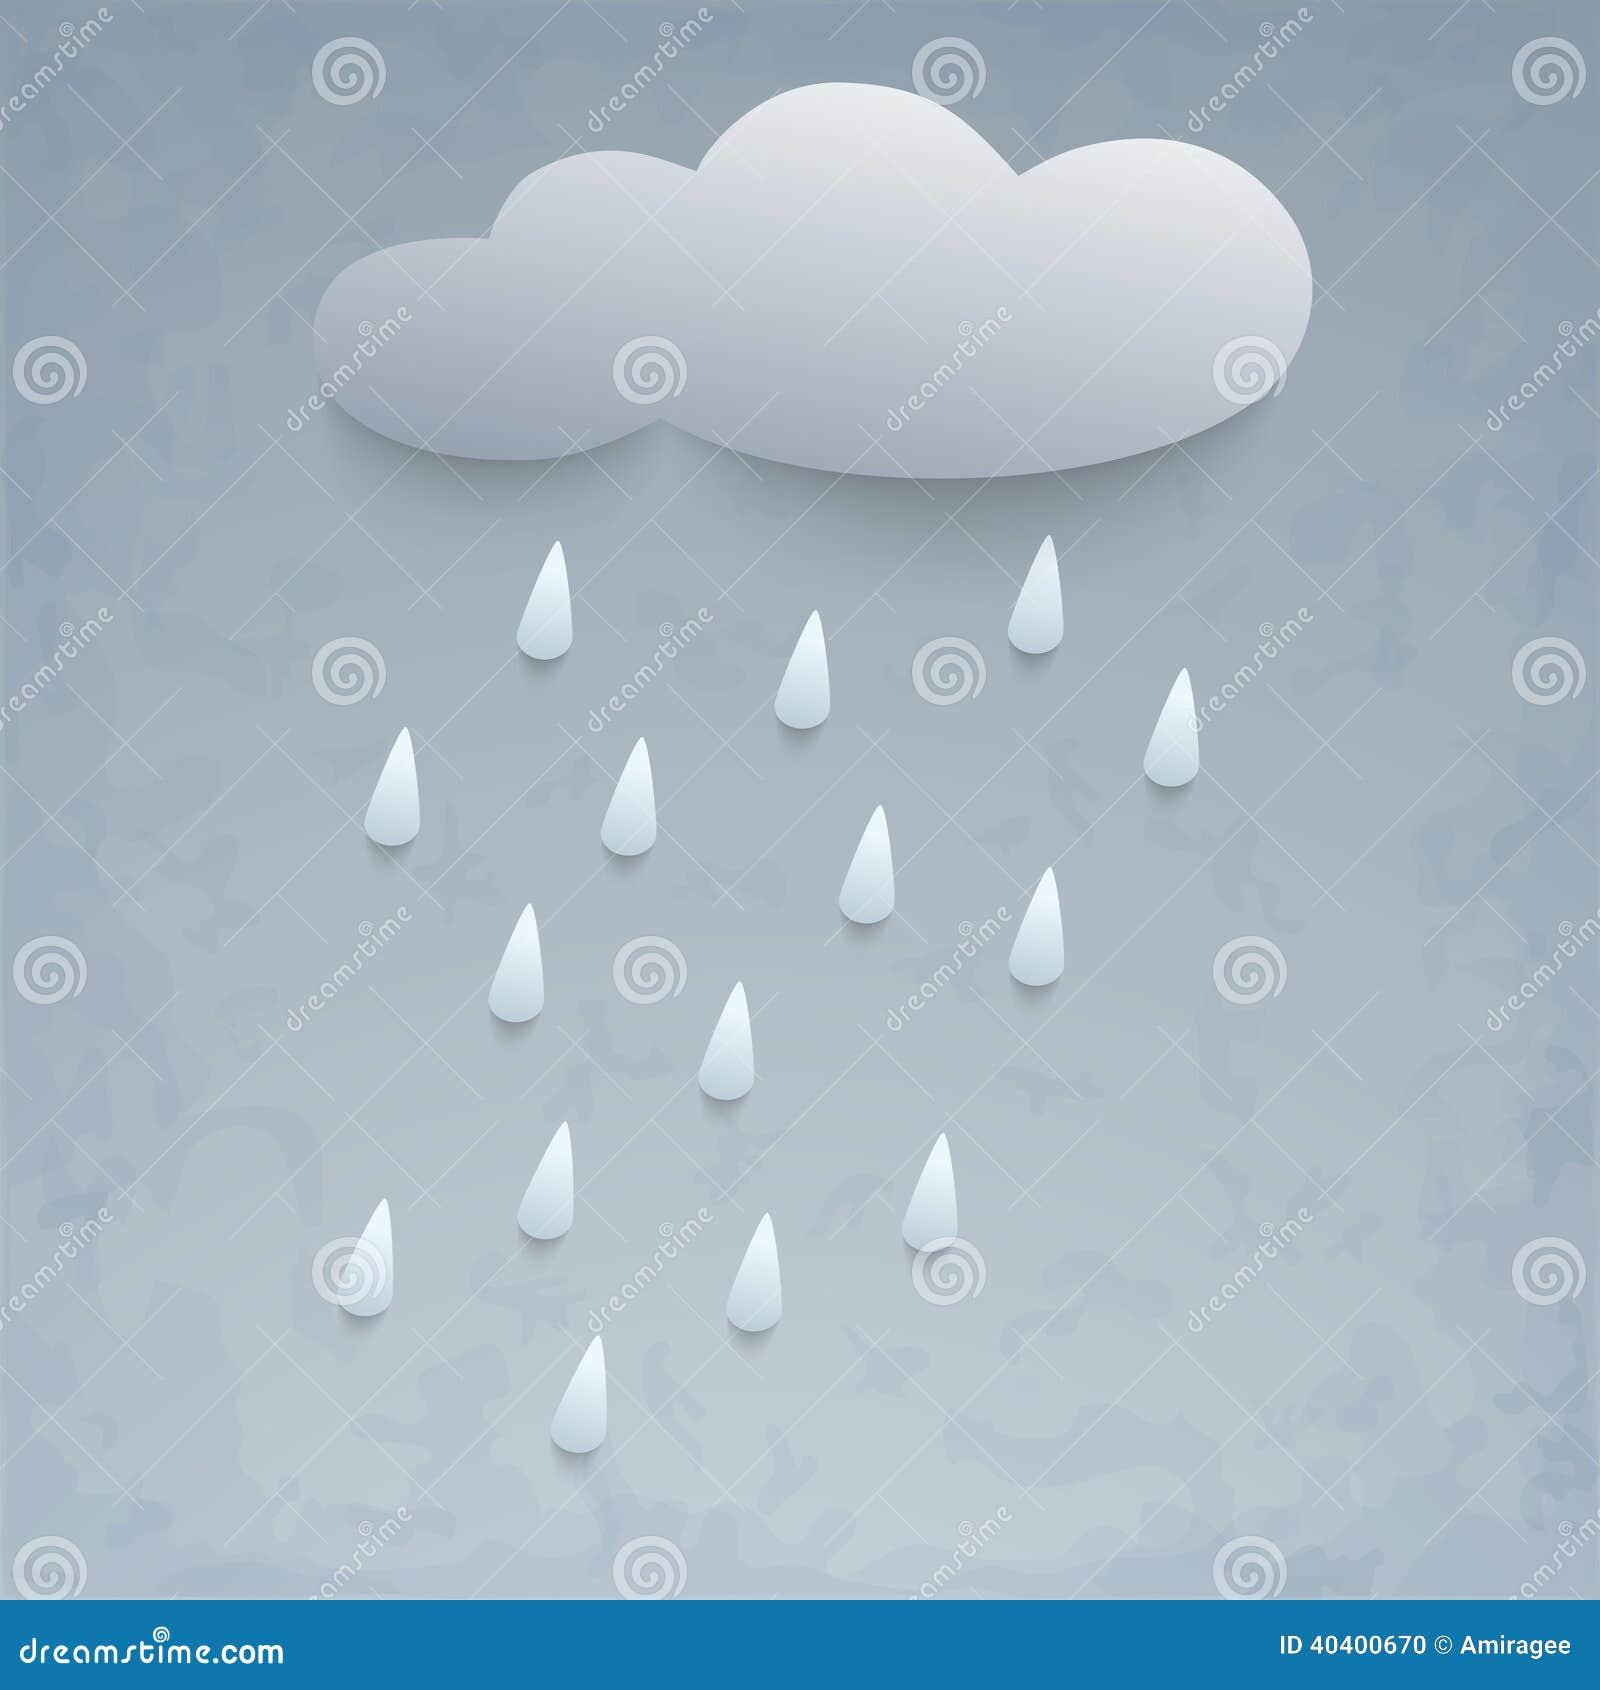 Illustration of rain and cloud.